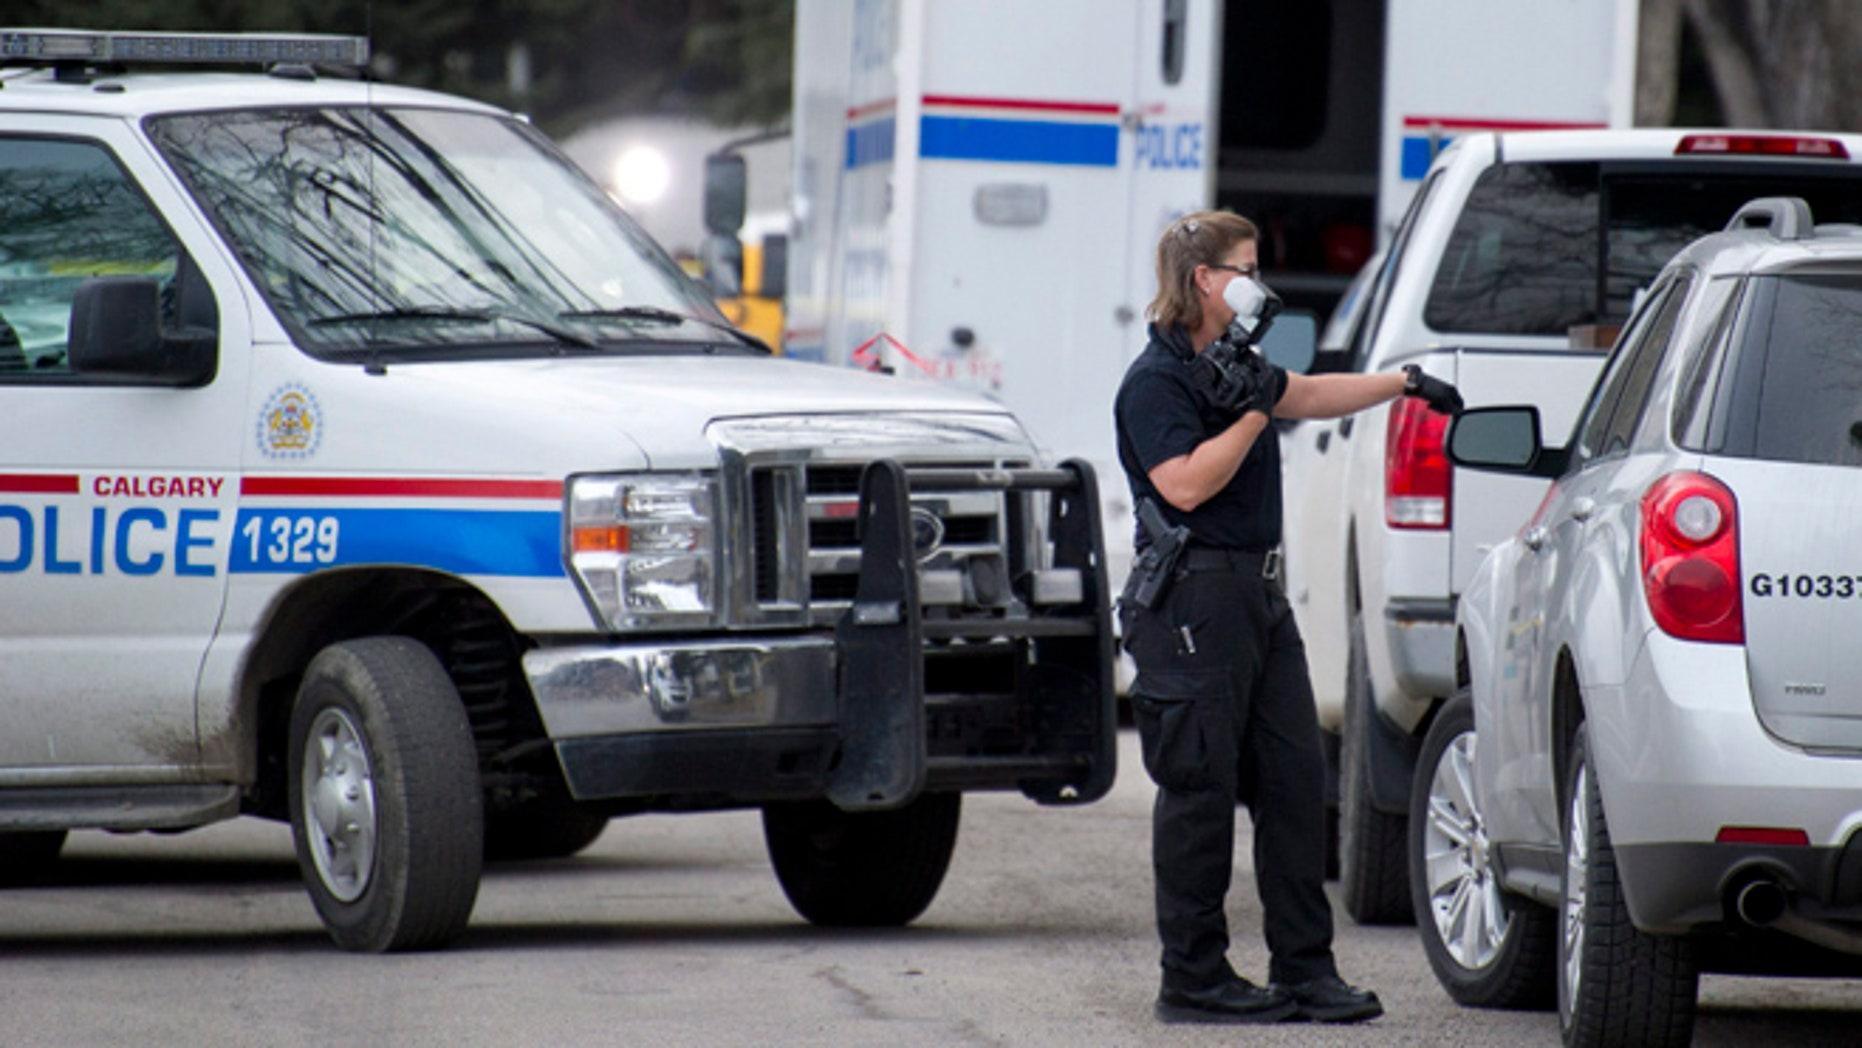 Apr. 15, 2014: Police investigate the scene of a multiple fatal stabbing in northwest Calgary, Alberta.